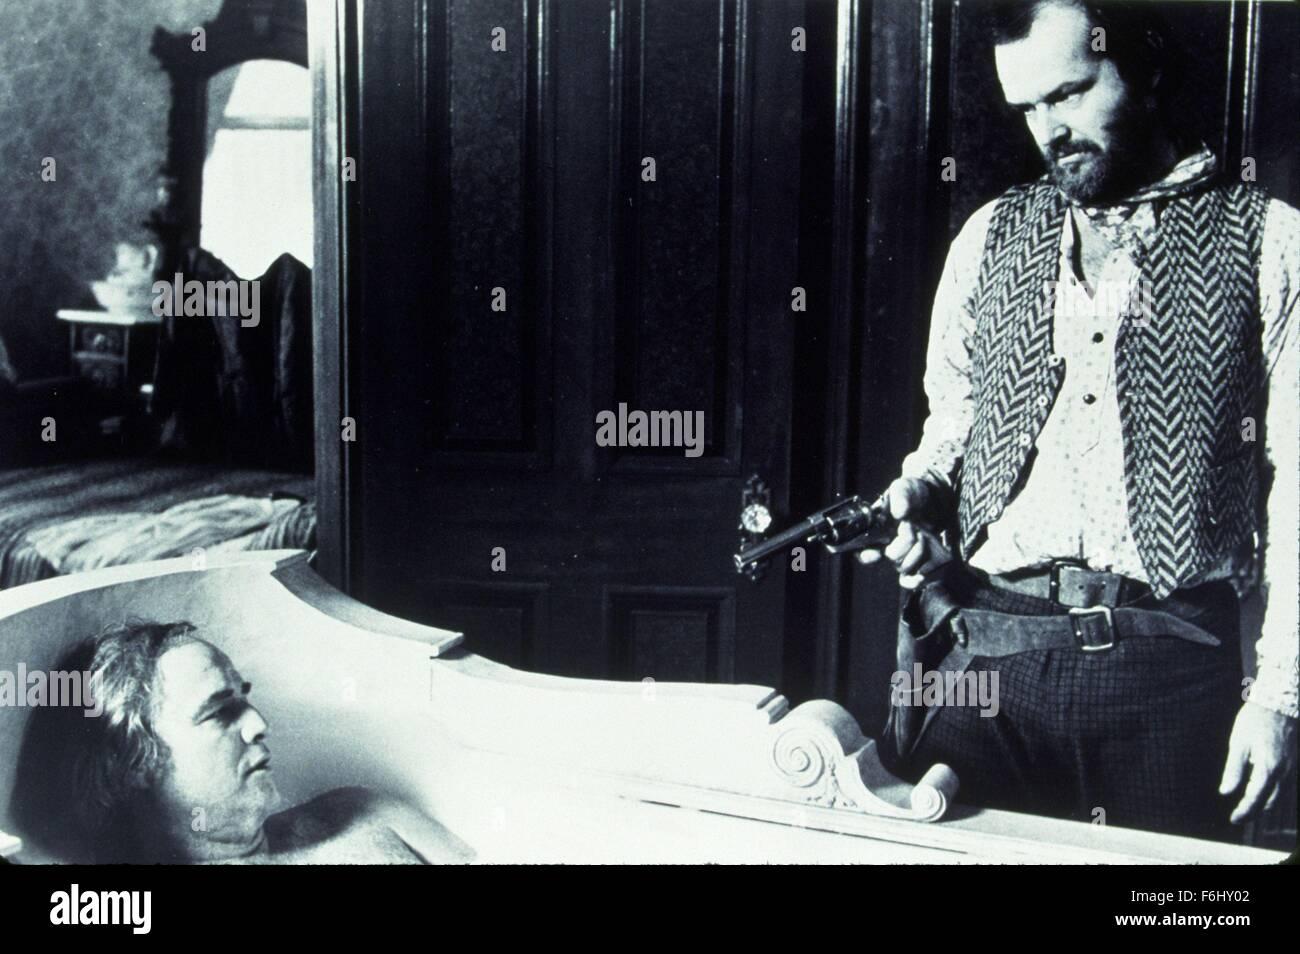 1976, Film Title: MISSOURI BREAKS, Pictured: BATH TUBS/ SHOWERS, BATHTUB, MARLON BRANDO, GUN CRAZY, HAND  GUN, JACK - Stock Image